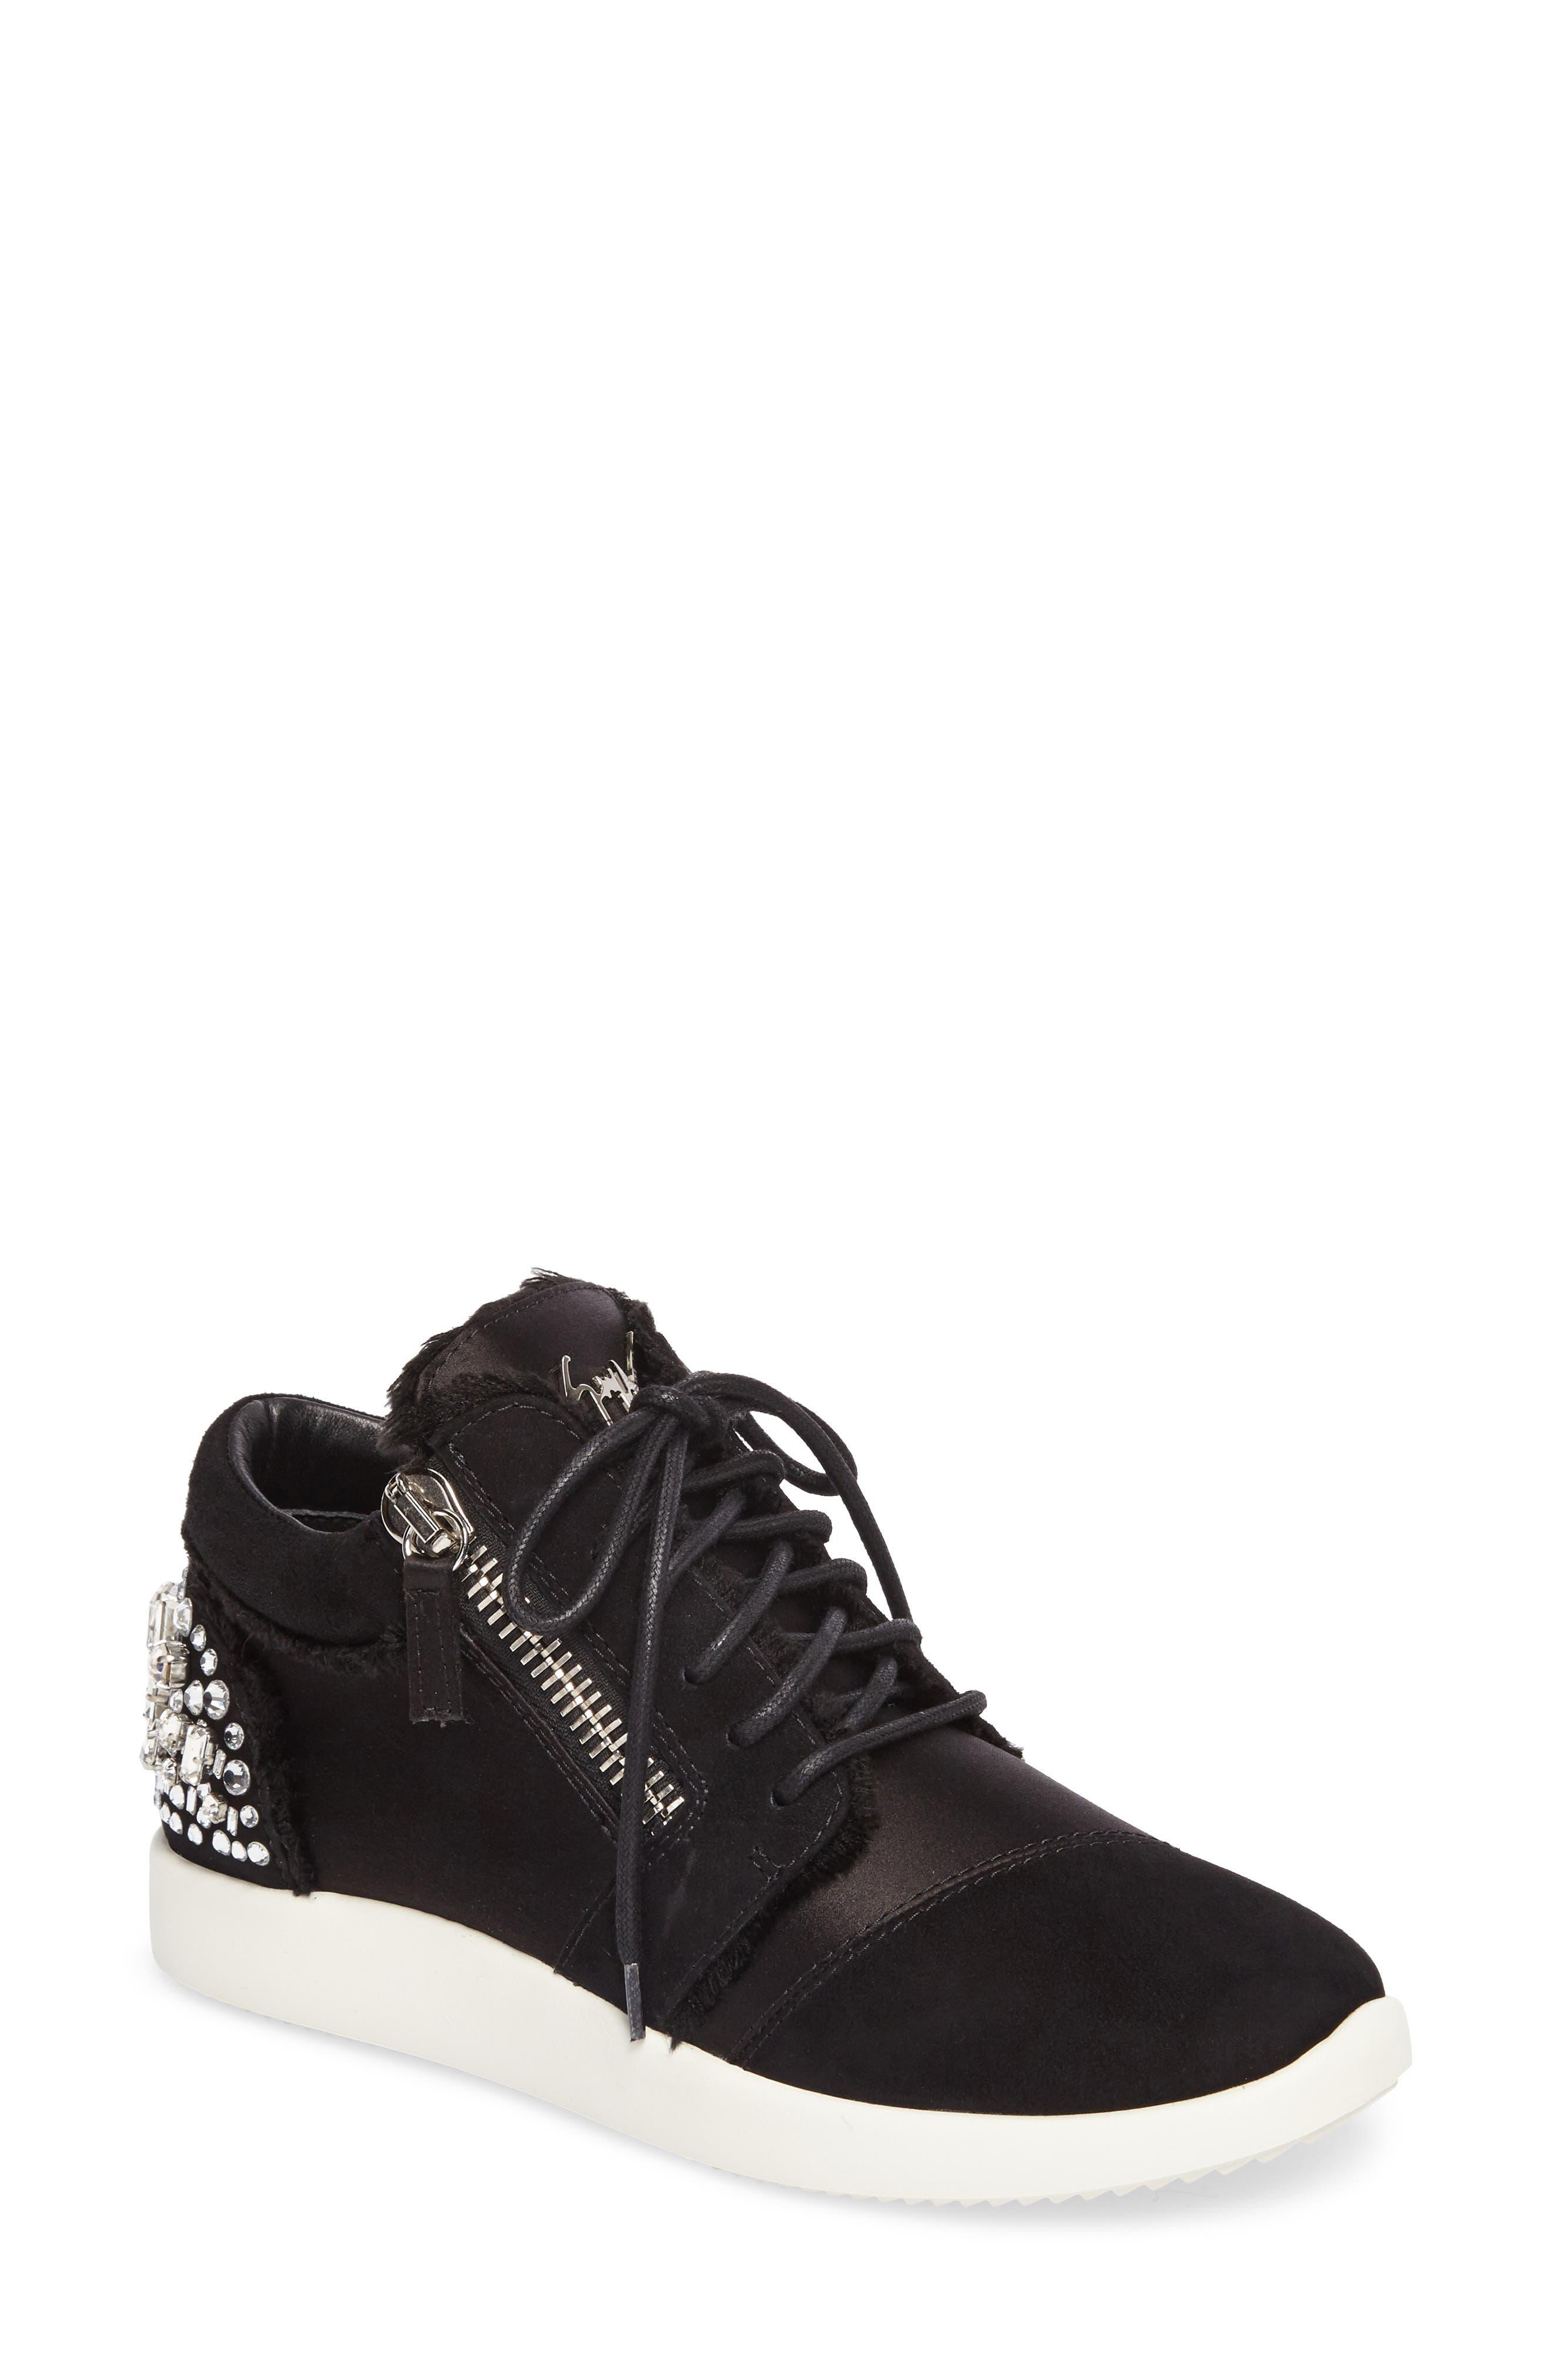 Giuseppe Zanotti Swarovski Crystal Embellished Sneaker (Women)